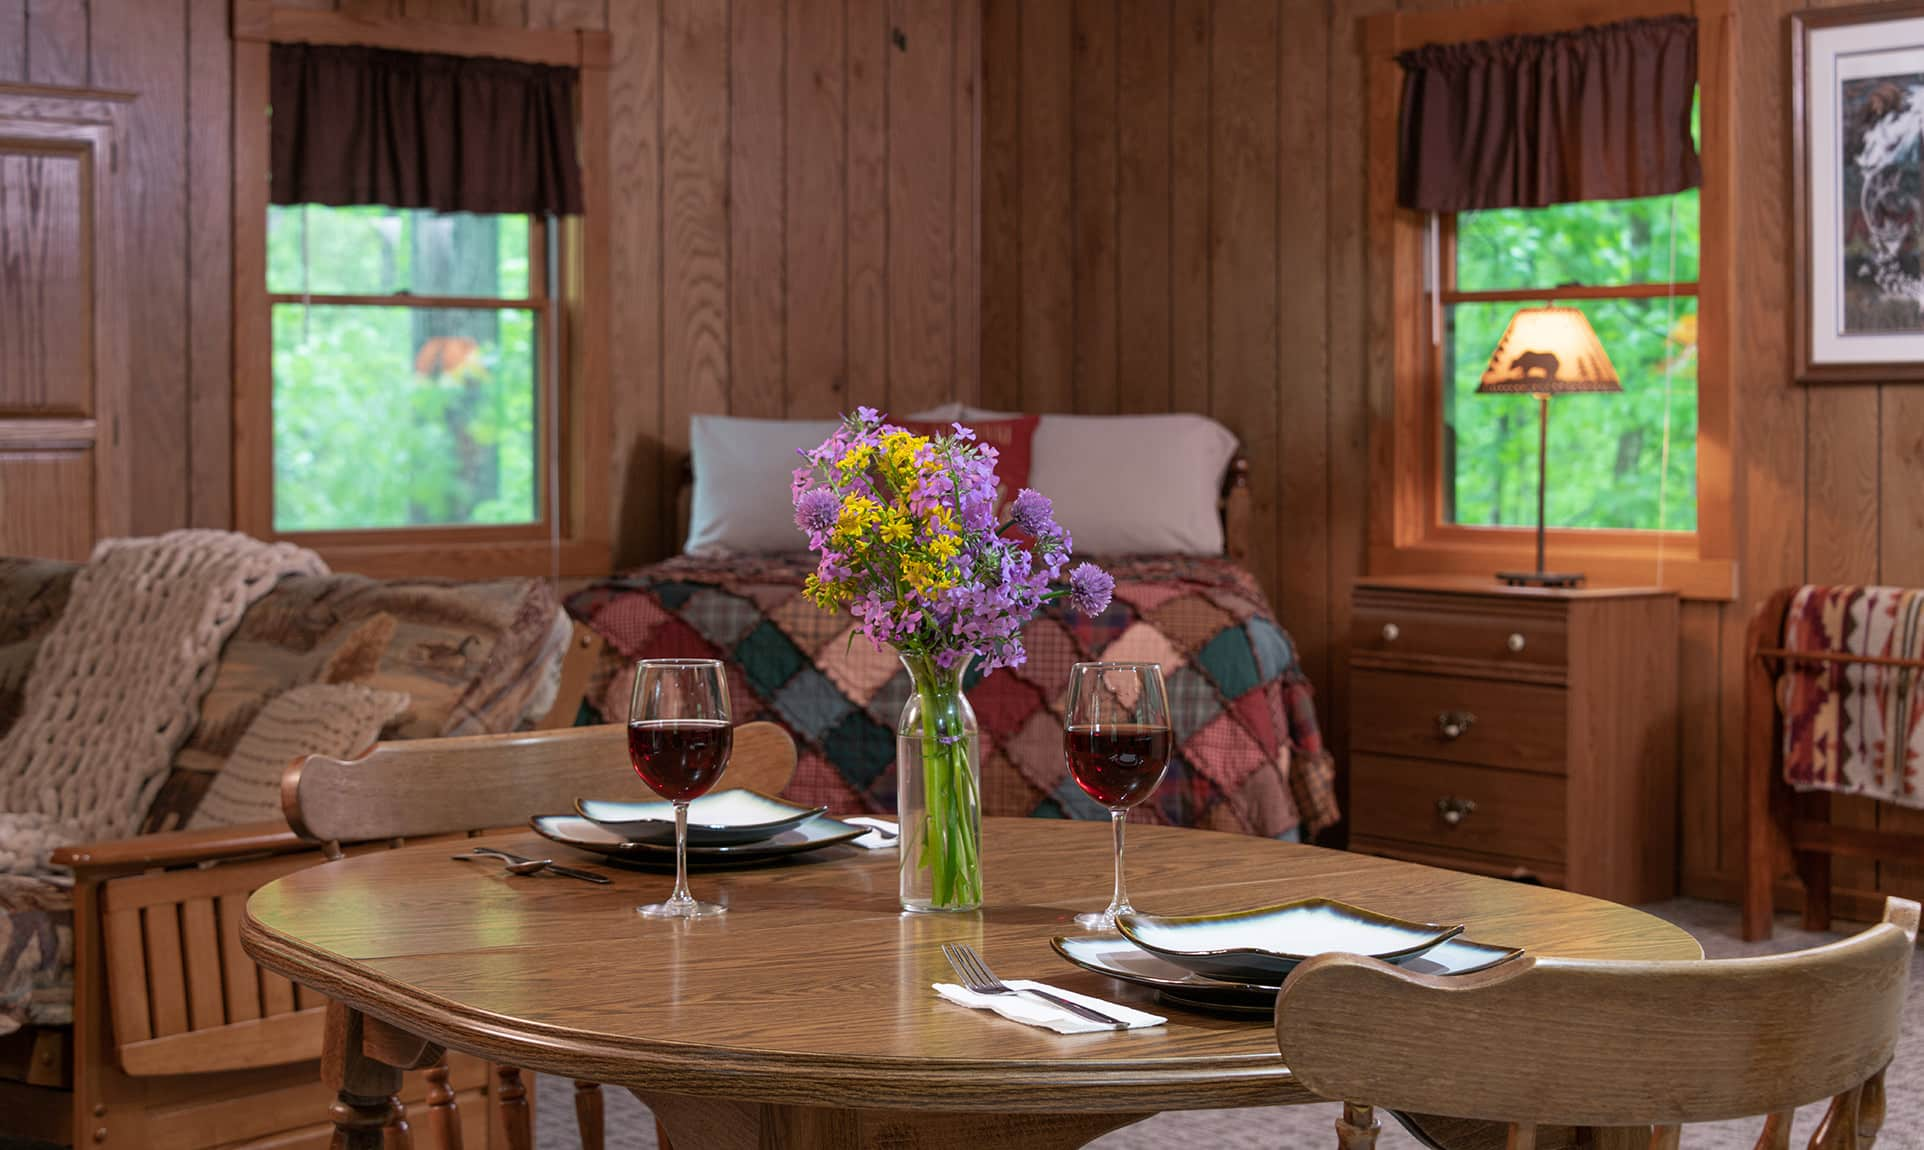 Apache Cabin dining table - a rustic Illinois cabin